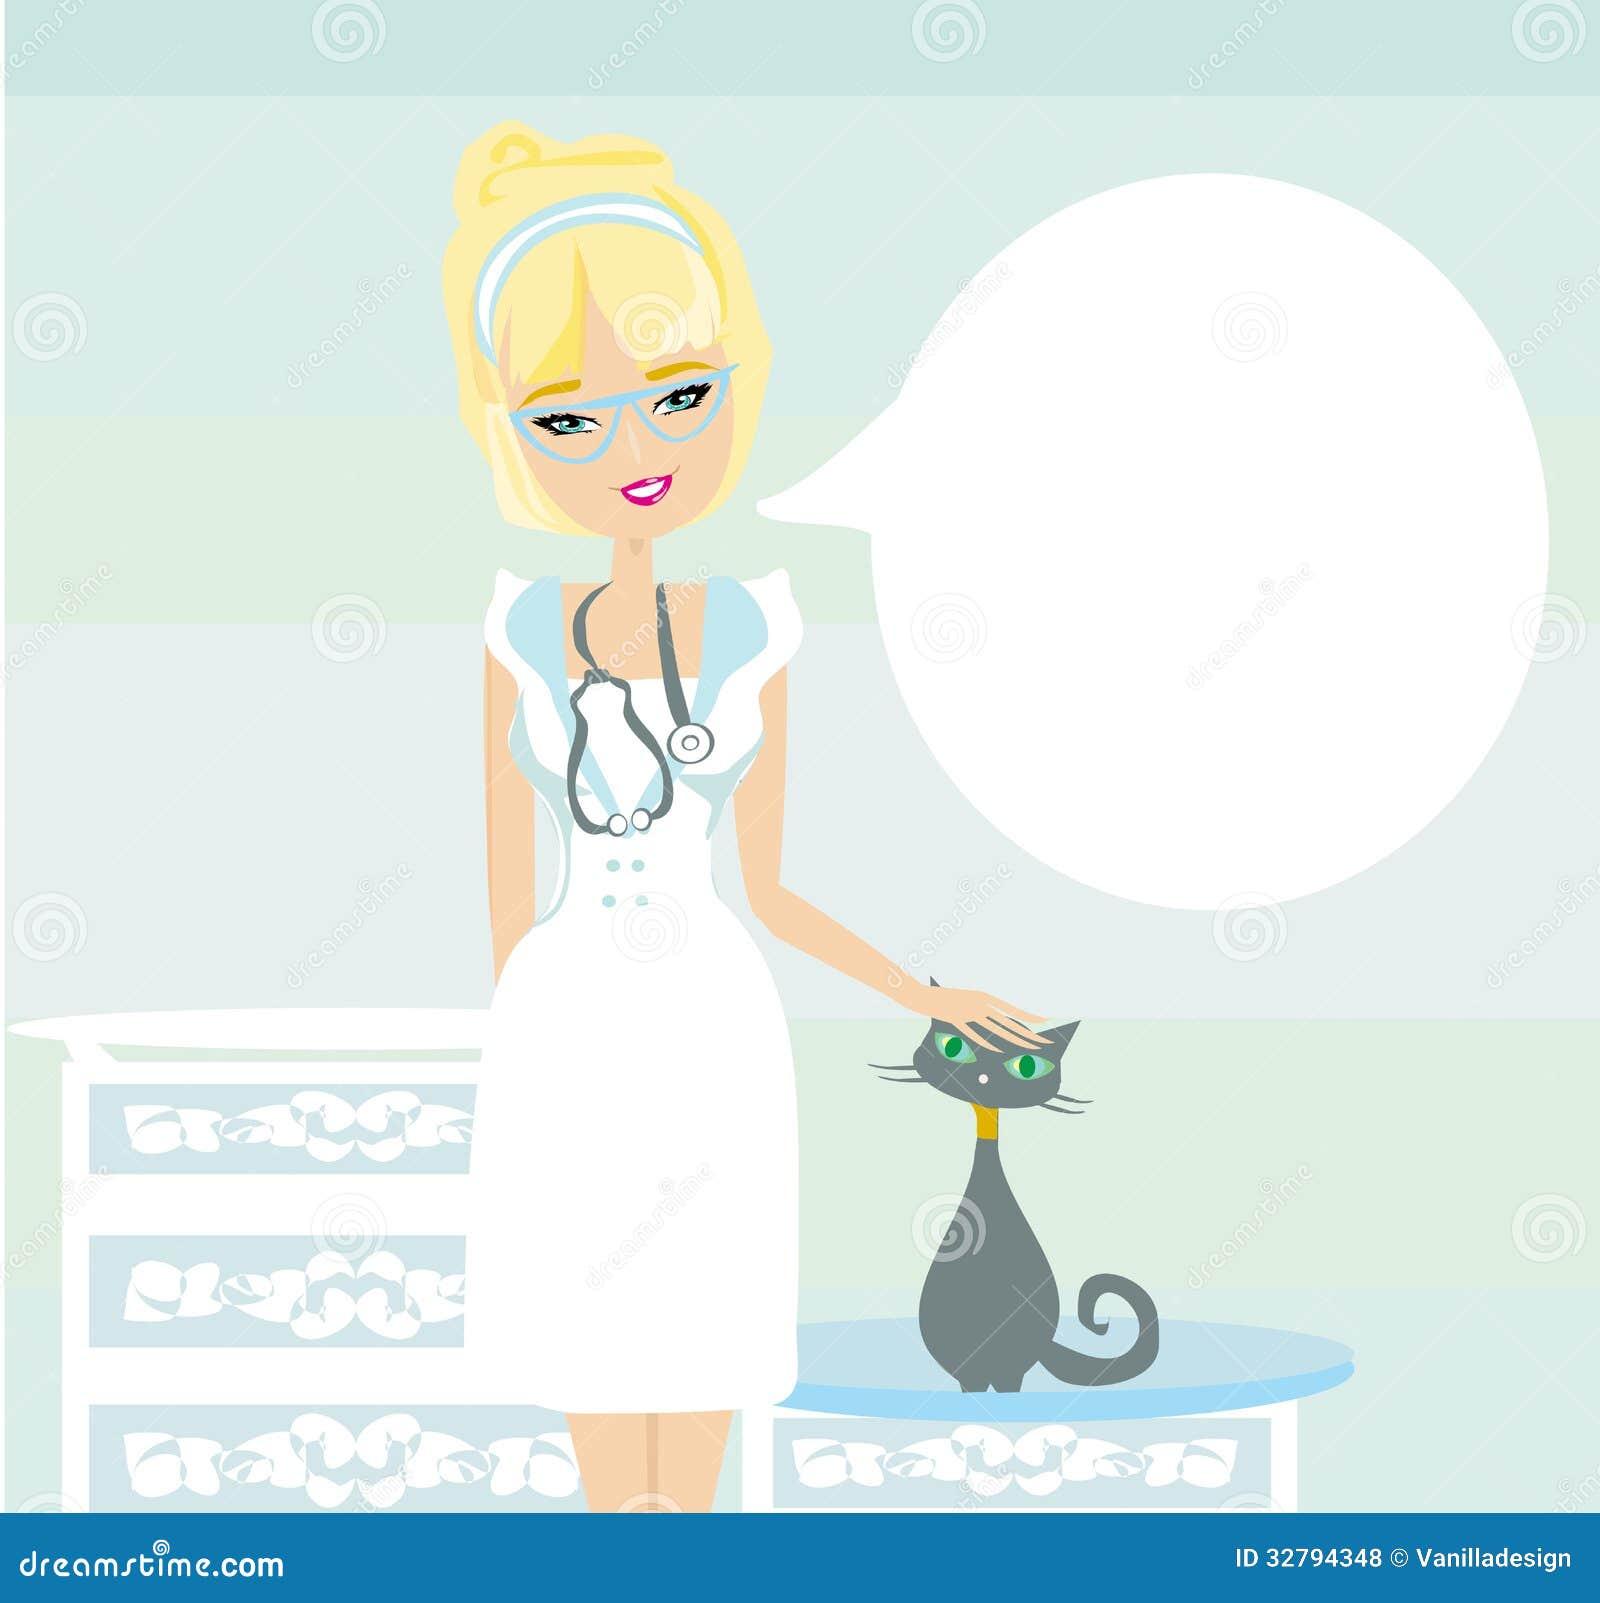 http://thumbs.dreamstime.com/z/woman-veterinarian-treated-cat-illustration-32794348.jpg Girl